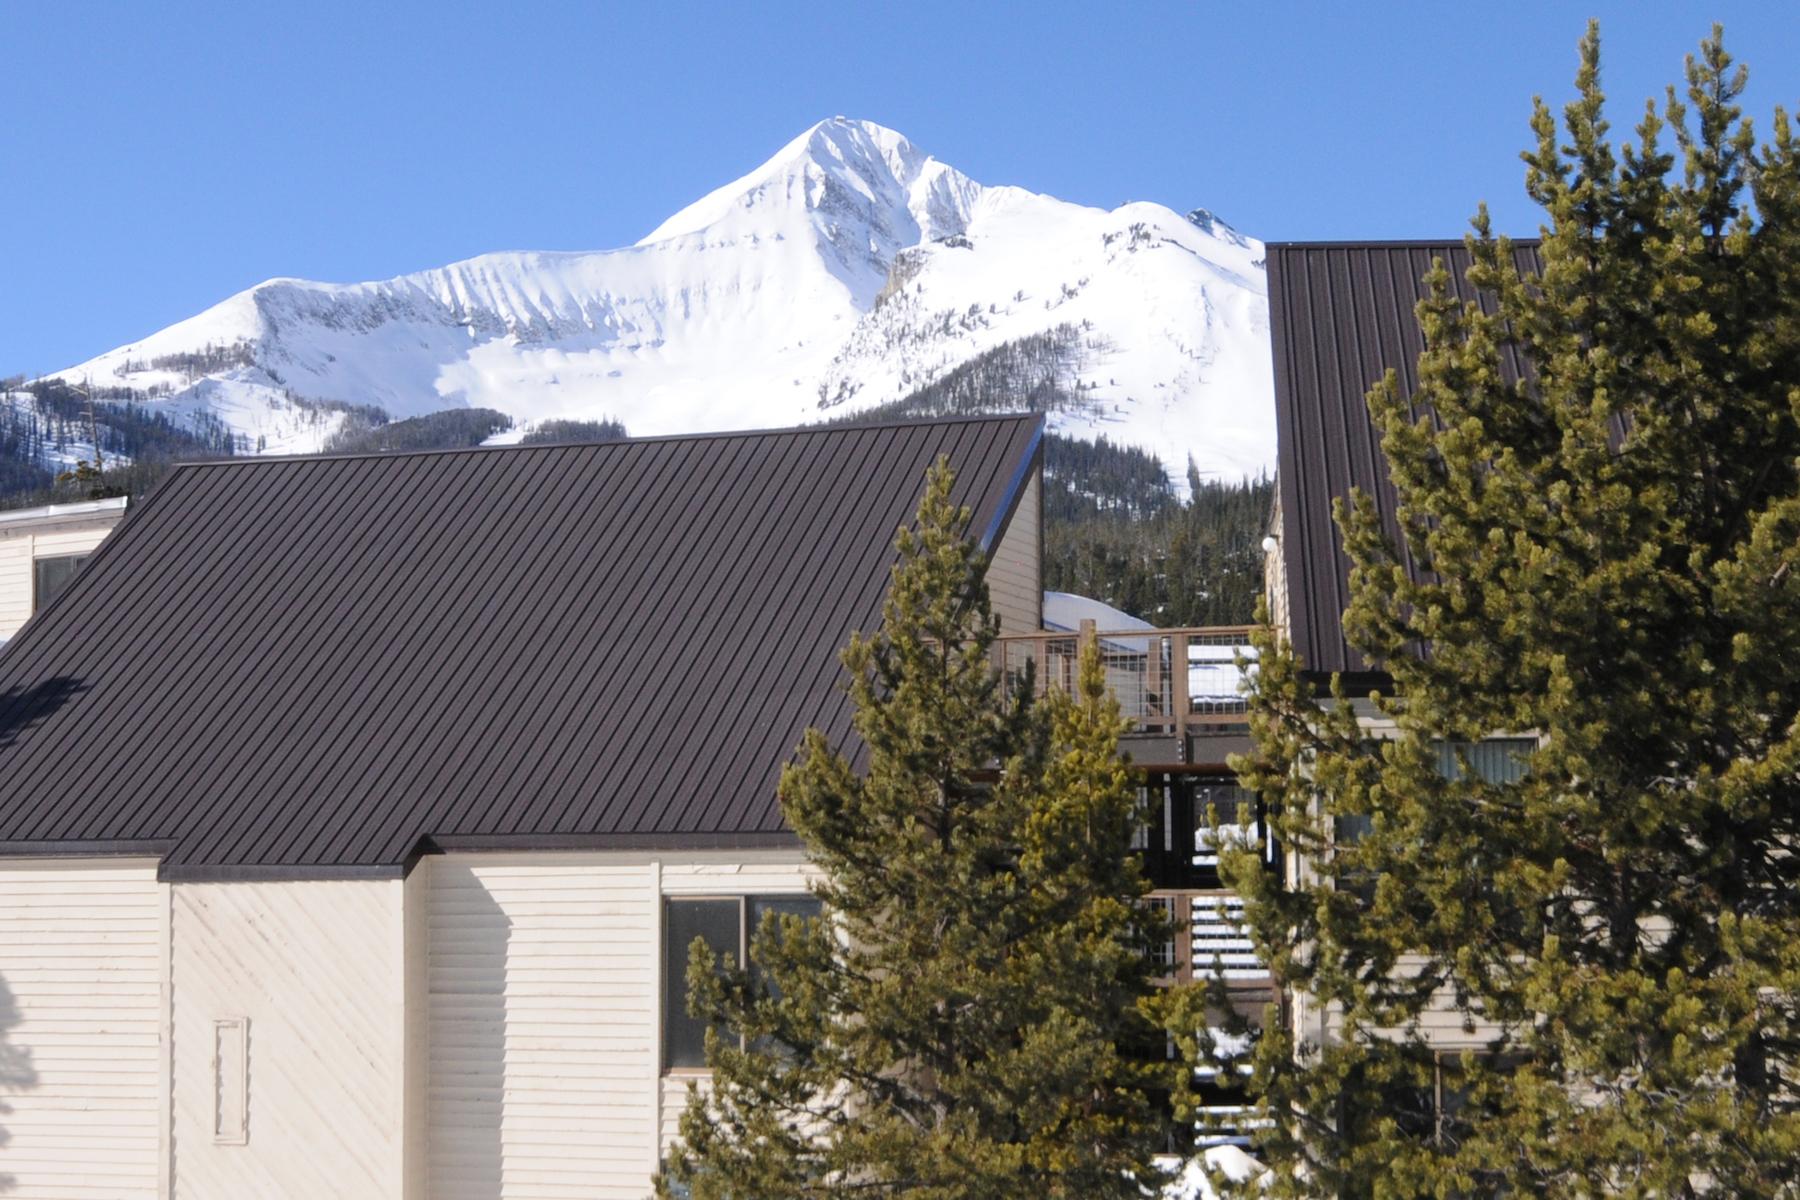 独户住宅 为 销售 在 Ski Condo at Big Sky Resort 21 Sitting Bull Road, Hill 1327 Big Sky, 蒙大拿州, 59716 美国